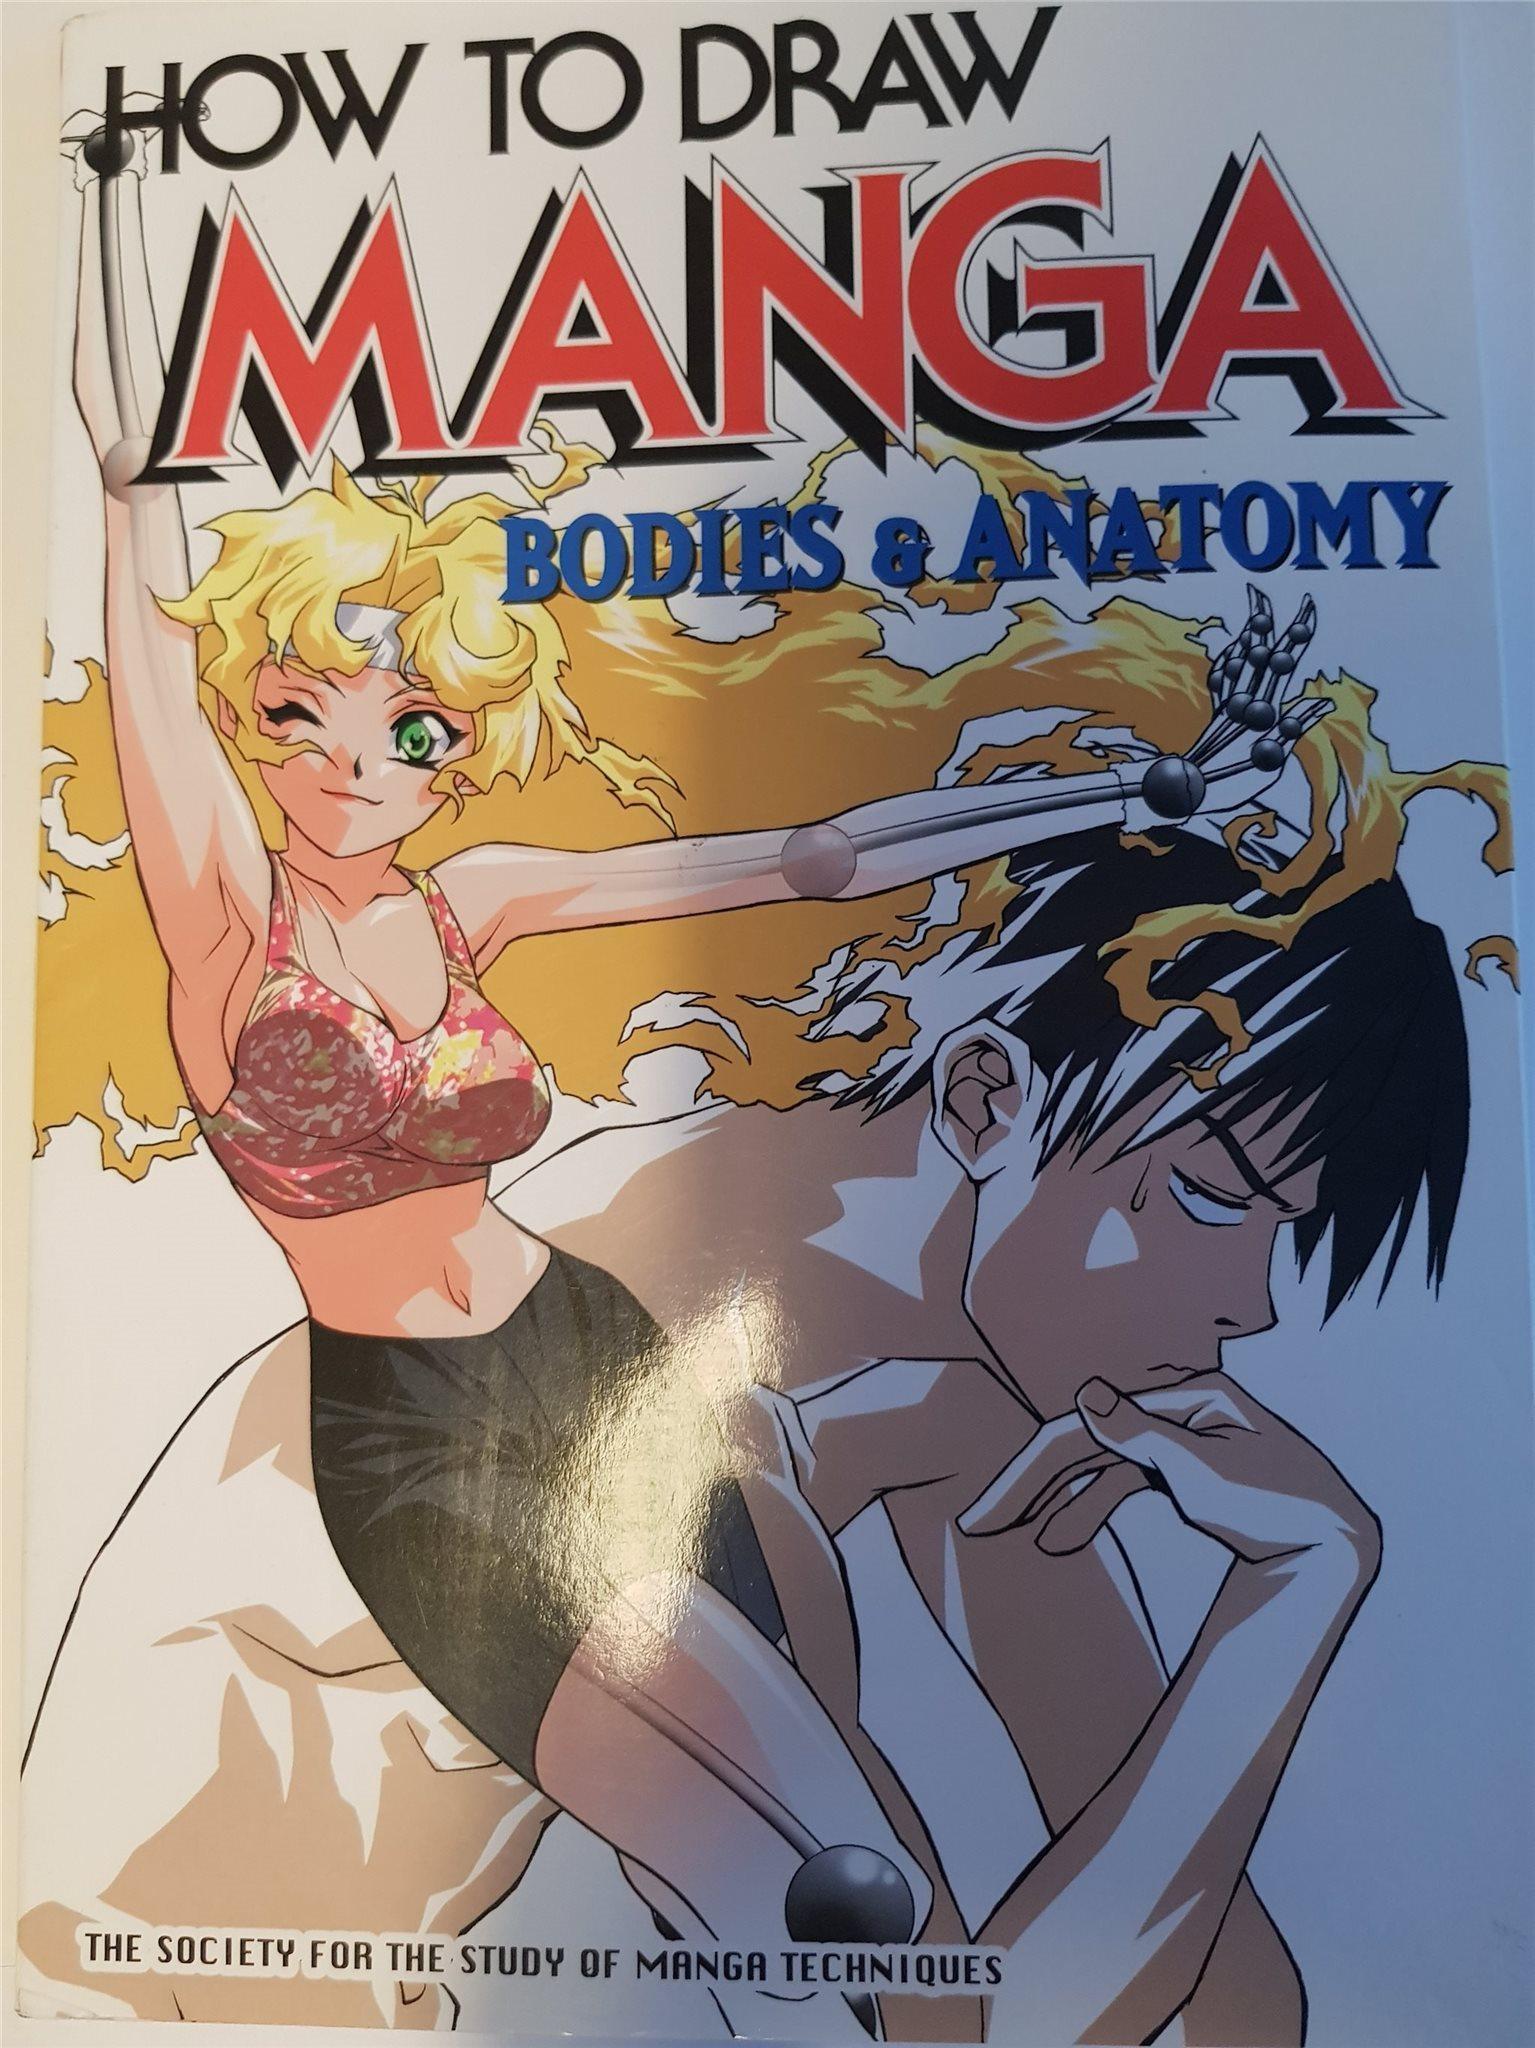 How to draw Manga #25 Bodies & Anatomy (319568872) ᐈ Köp på Tradera